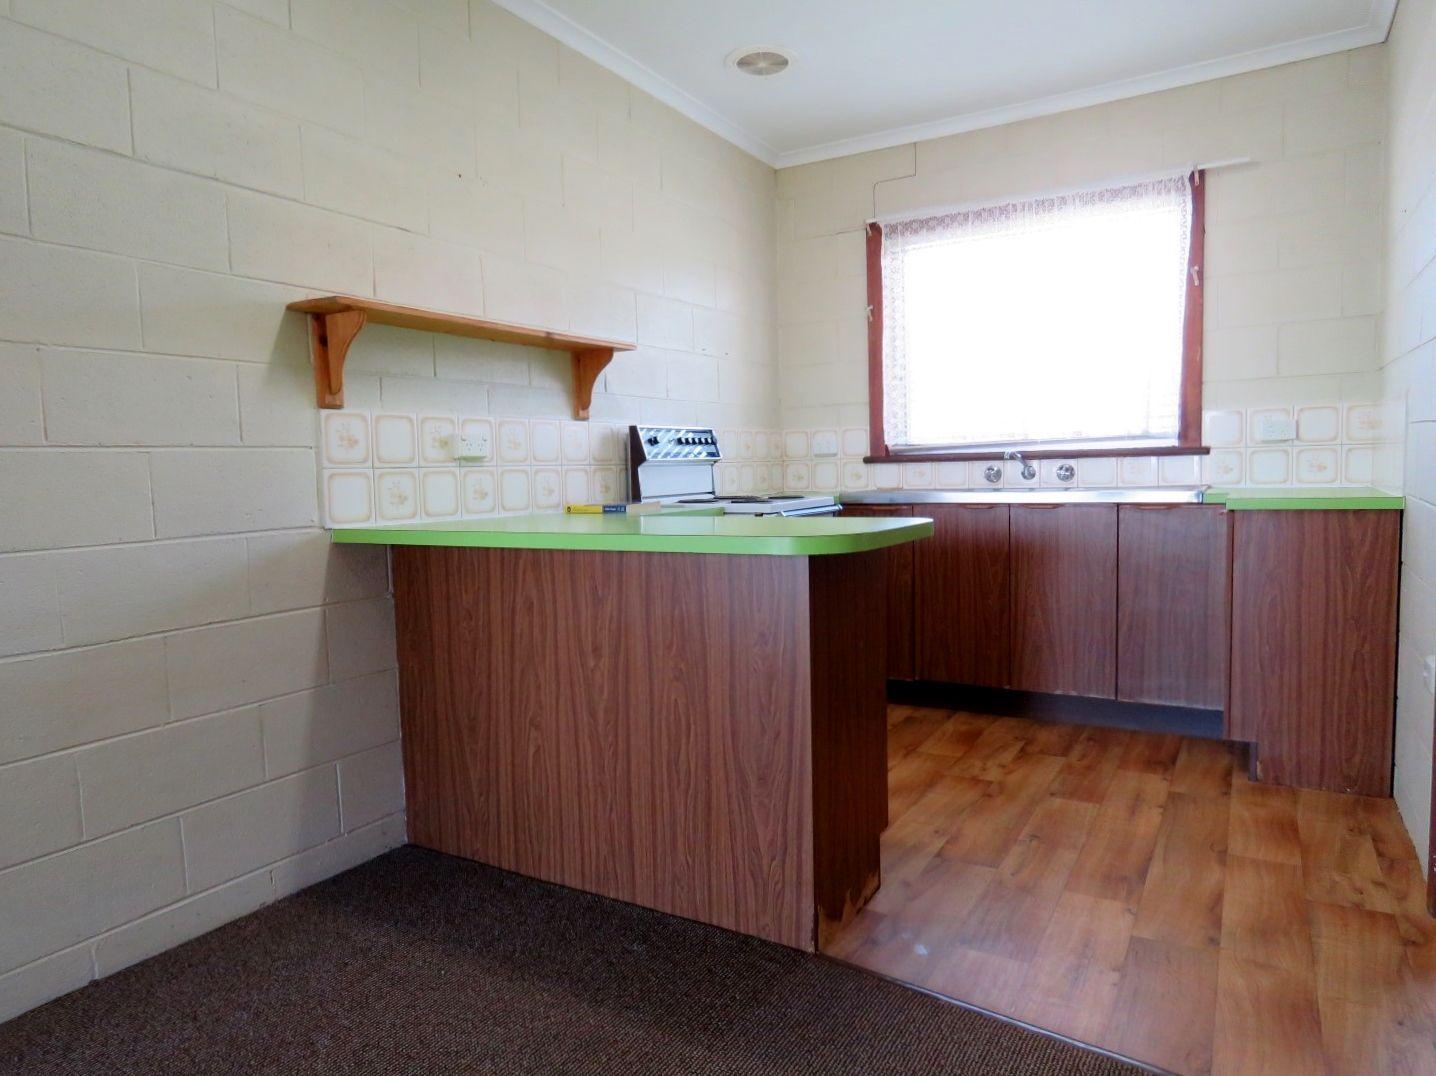 3/620 Prune Street, Lavington NSW 2641, Image 1